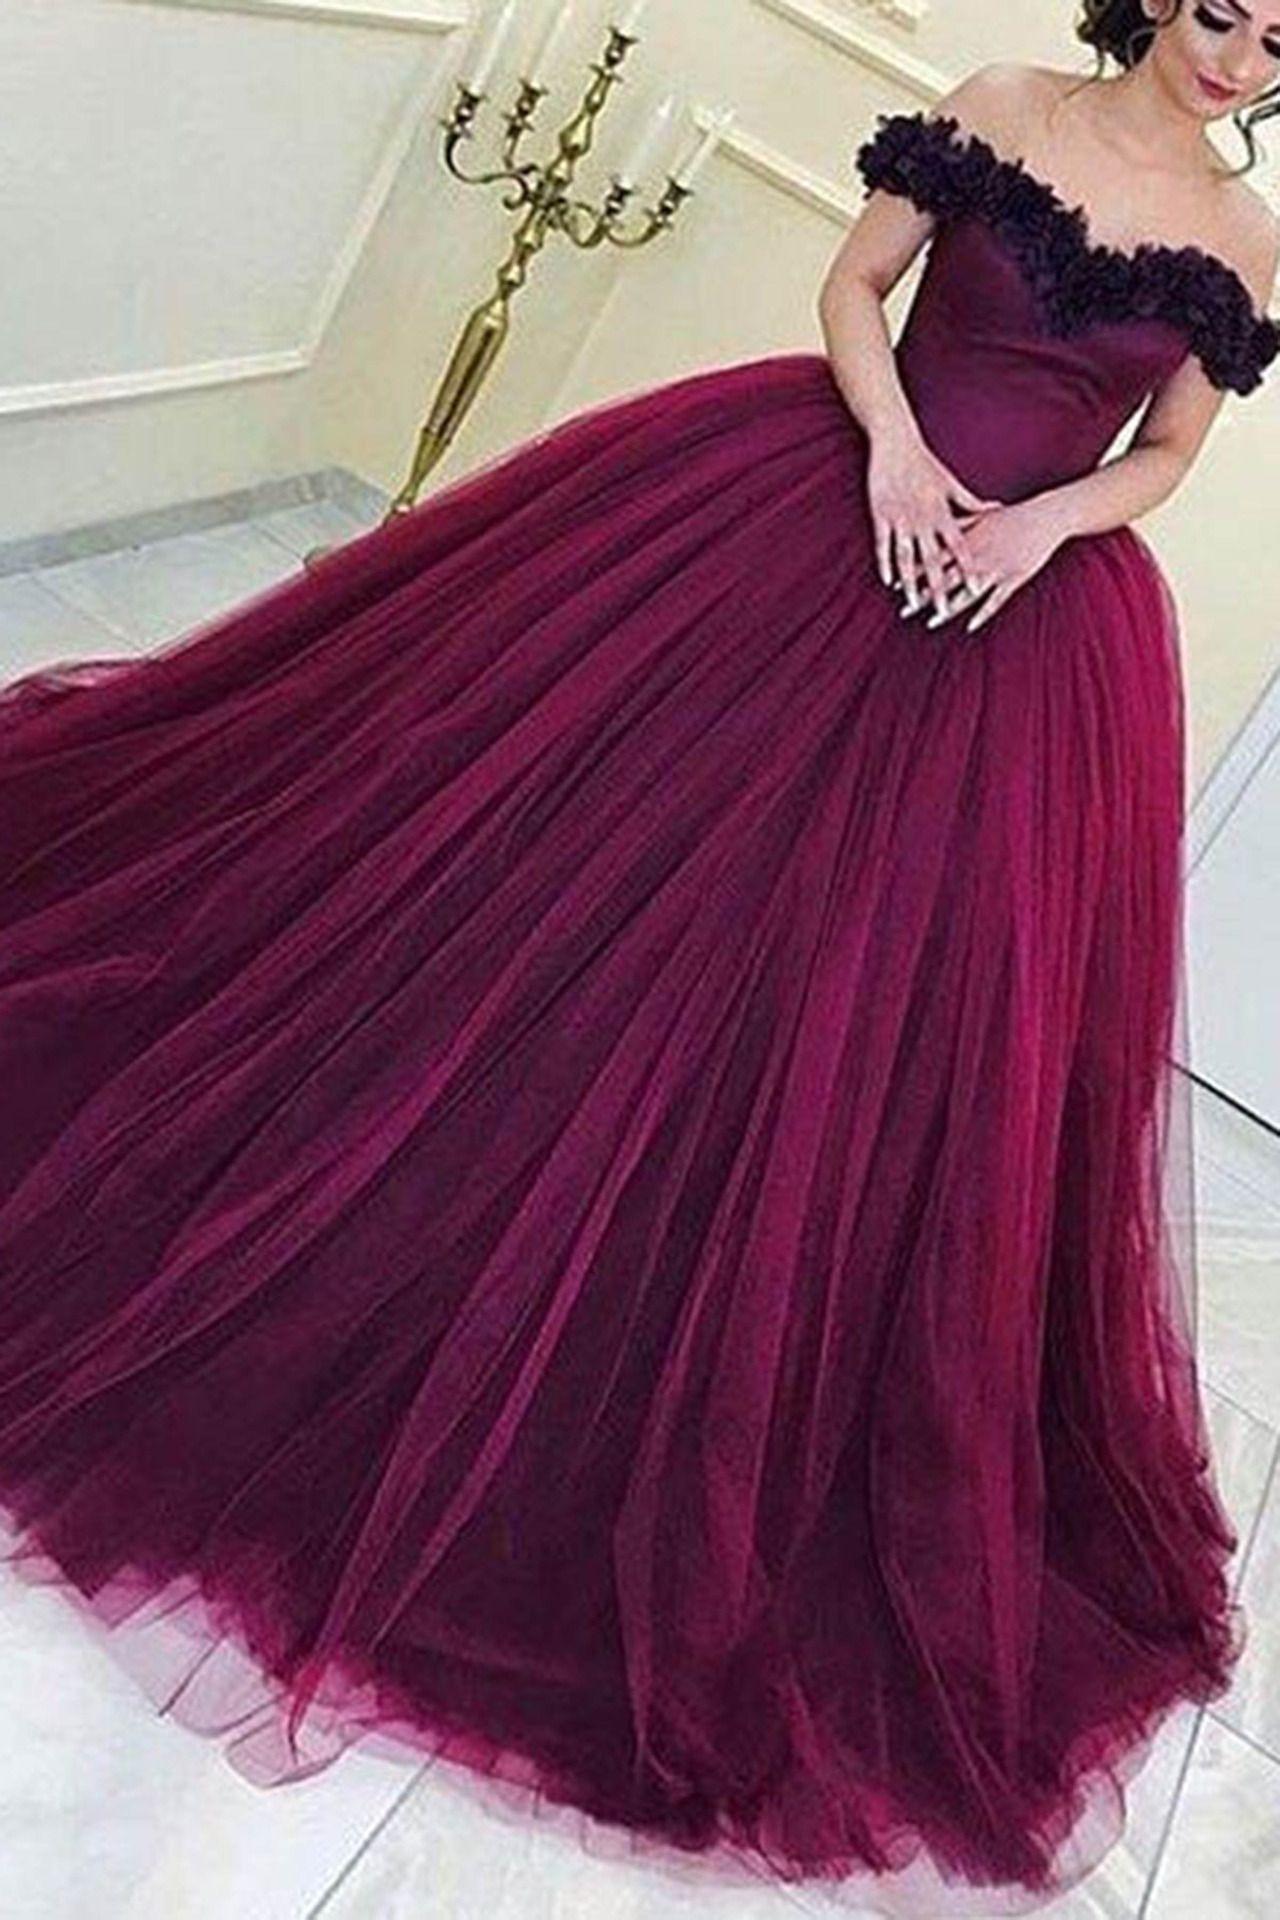 c7b0f683b32 Elegant plum tulle off the shoulder prom dress